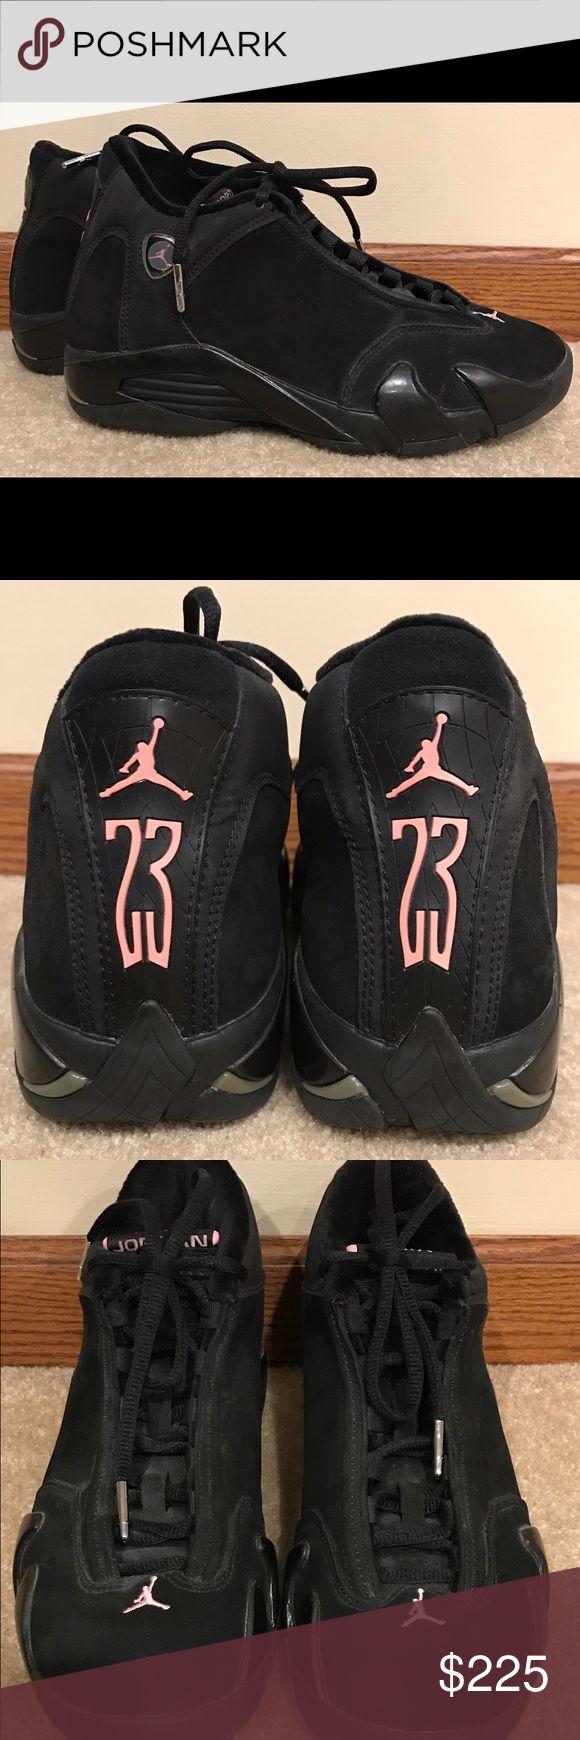 Air Jordan XIV (14) Retro Black & Pink Shoes - US7 Authentic Air Jordan XIV (14) Retro Basketball Shoes -New without box -Unworn -US Size 7 -Black and pink in color -Super retro and baller Air Jordan Shoes Athletic Shoes